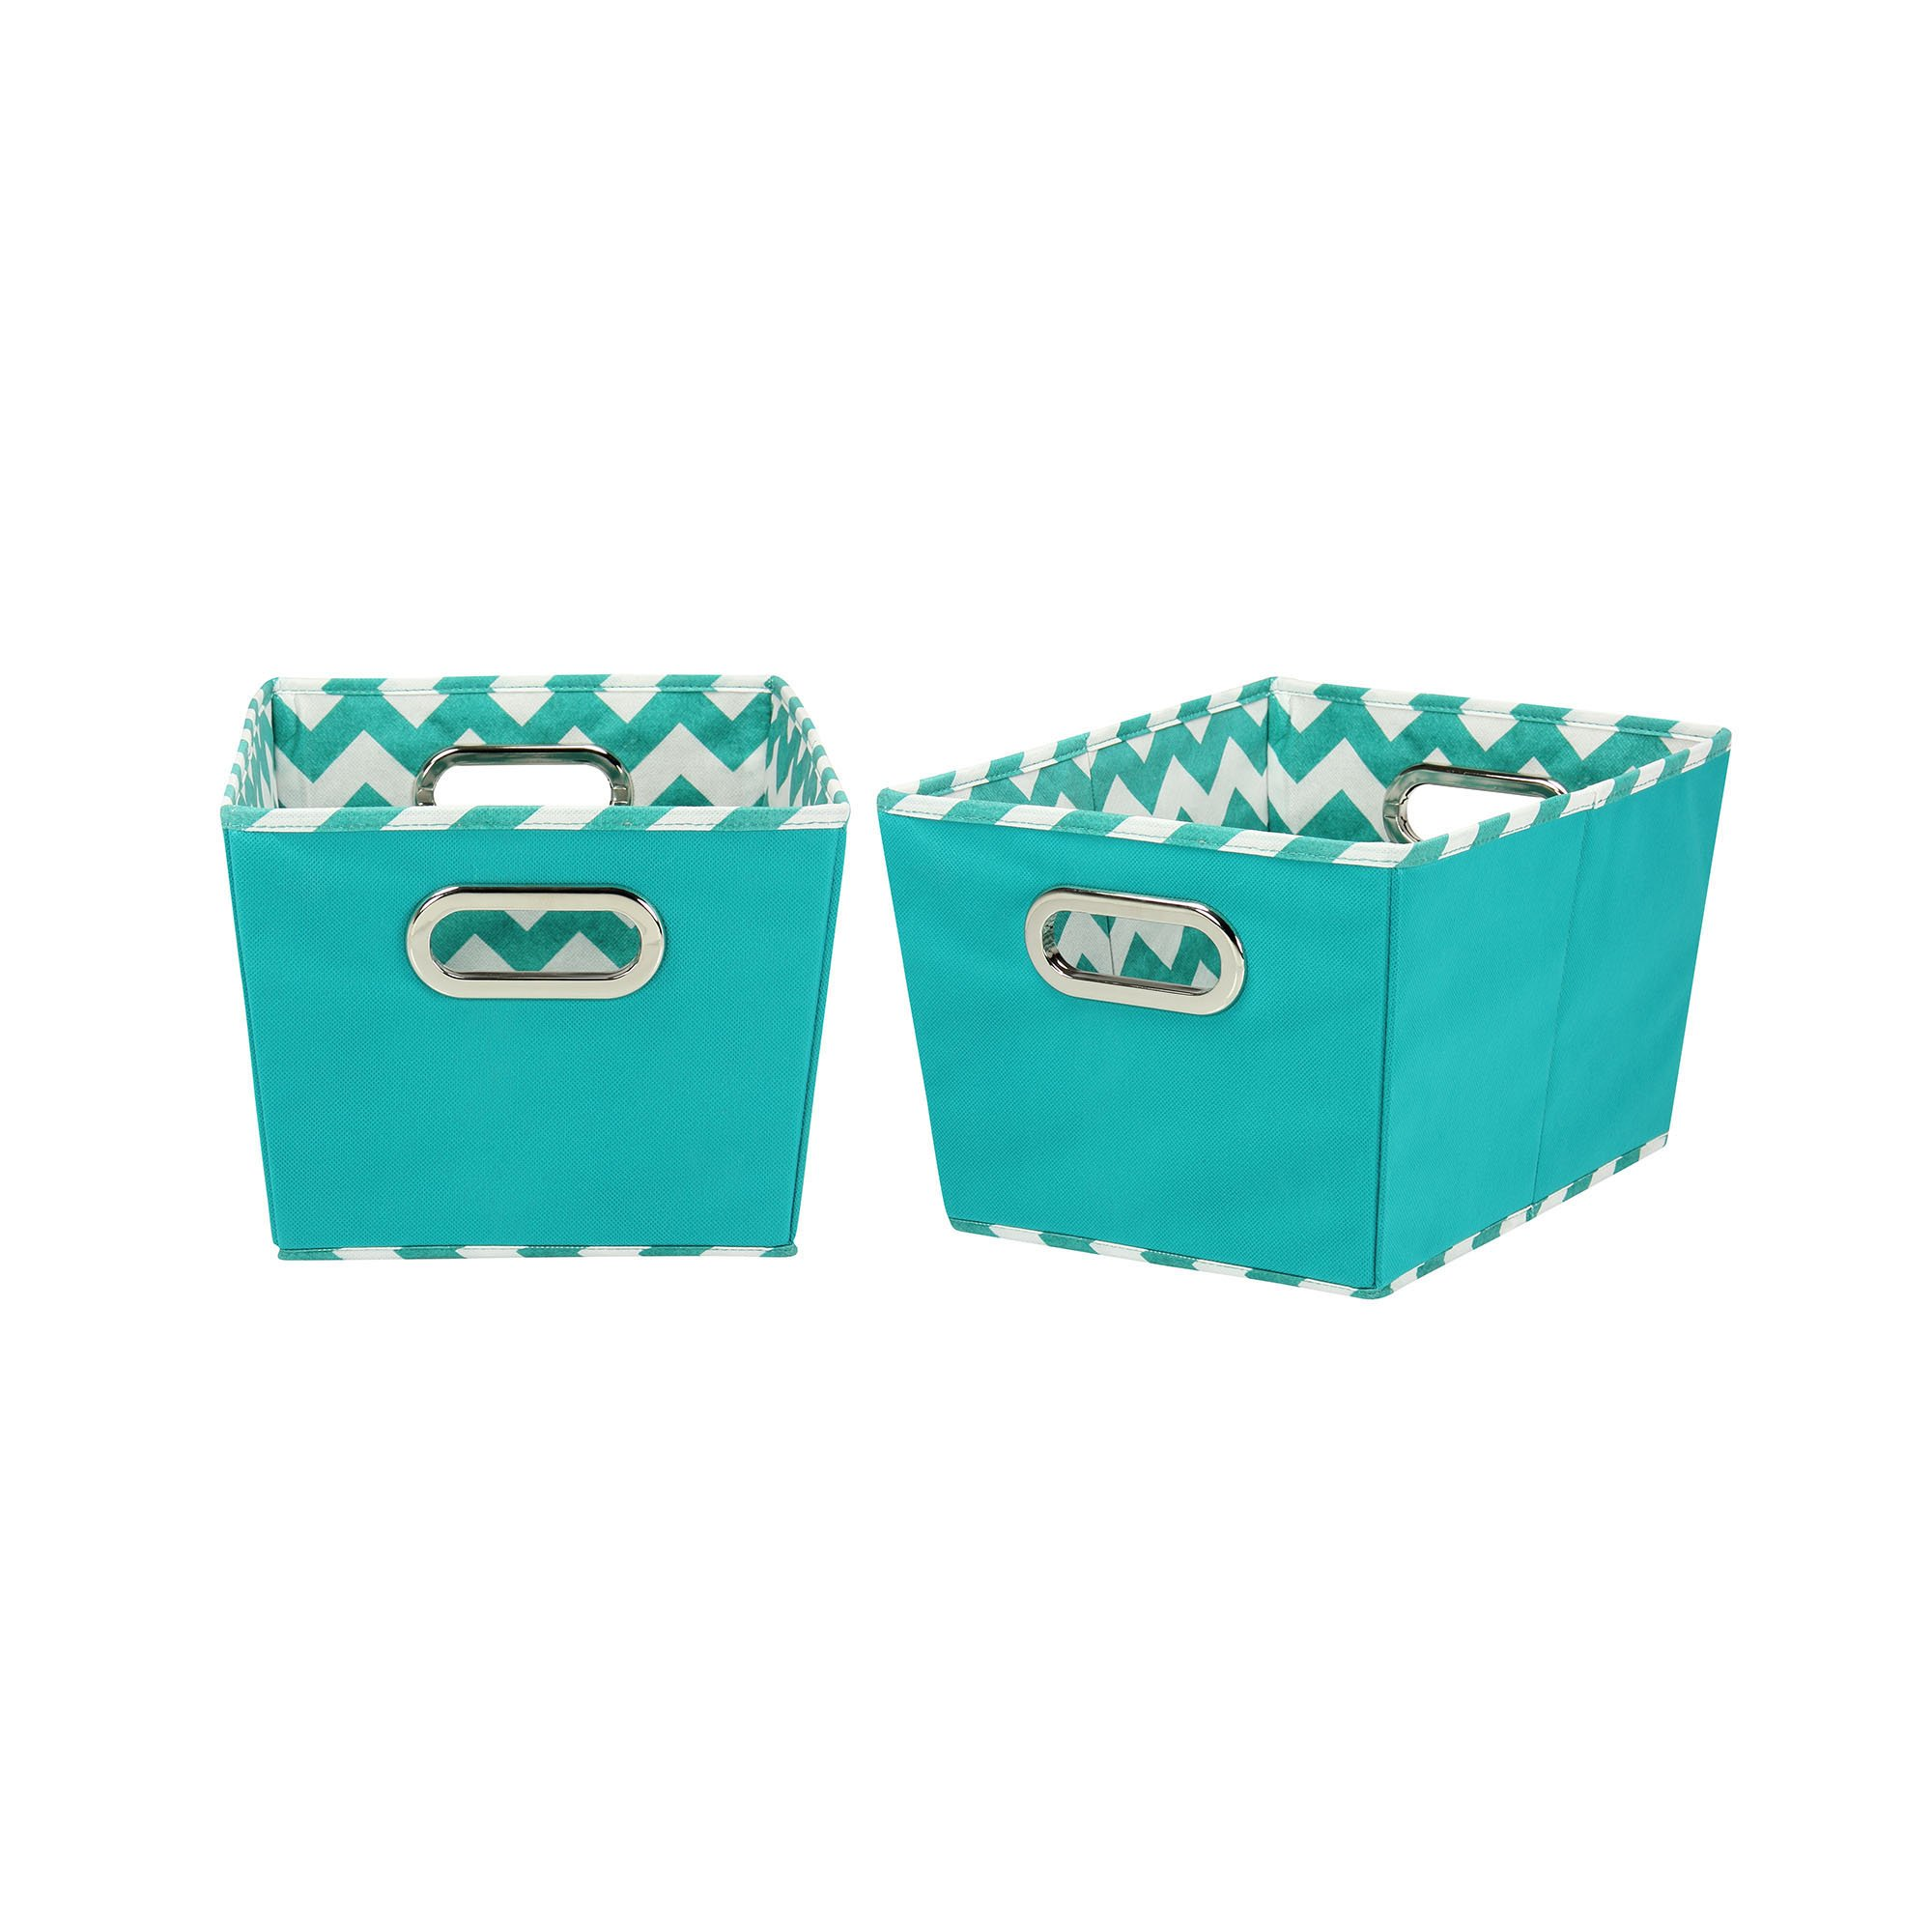 Household Essentials 70-1 Small Tapered Decorative Storage Bins | 2 Pack Set Cubby Baskets | Aqua Chevron